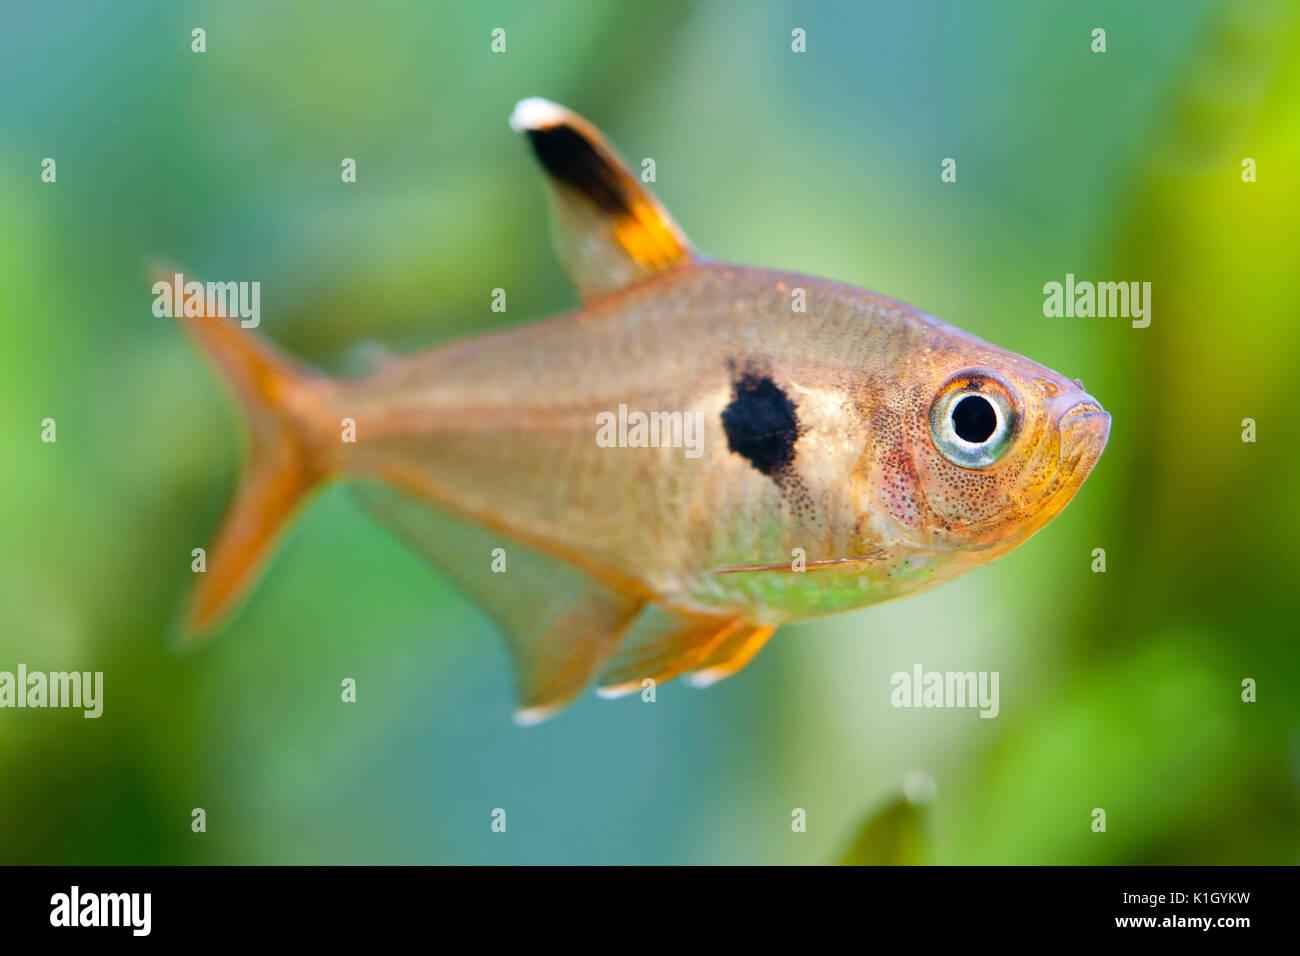 Beautiful planted tropical freshwater aquarium stock for Beautiful tropical fish